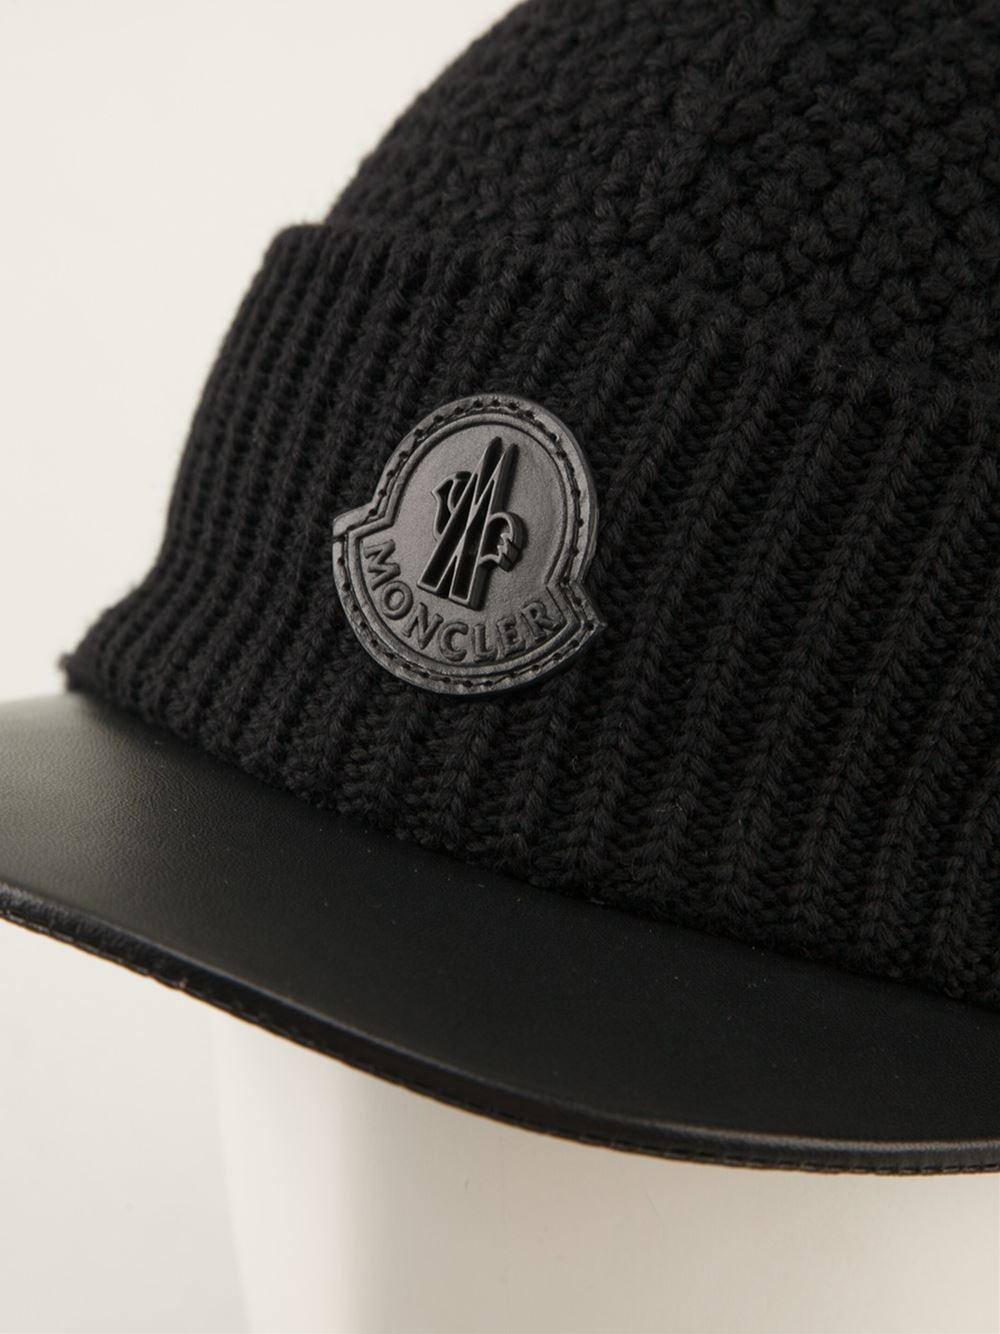 Lyst - Moncler Knitted Visor Hat in Black for Men 952872fadf1